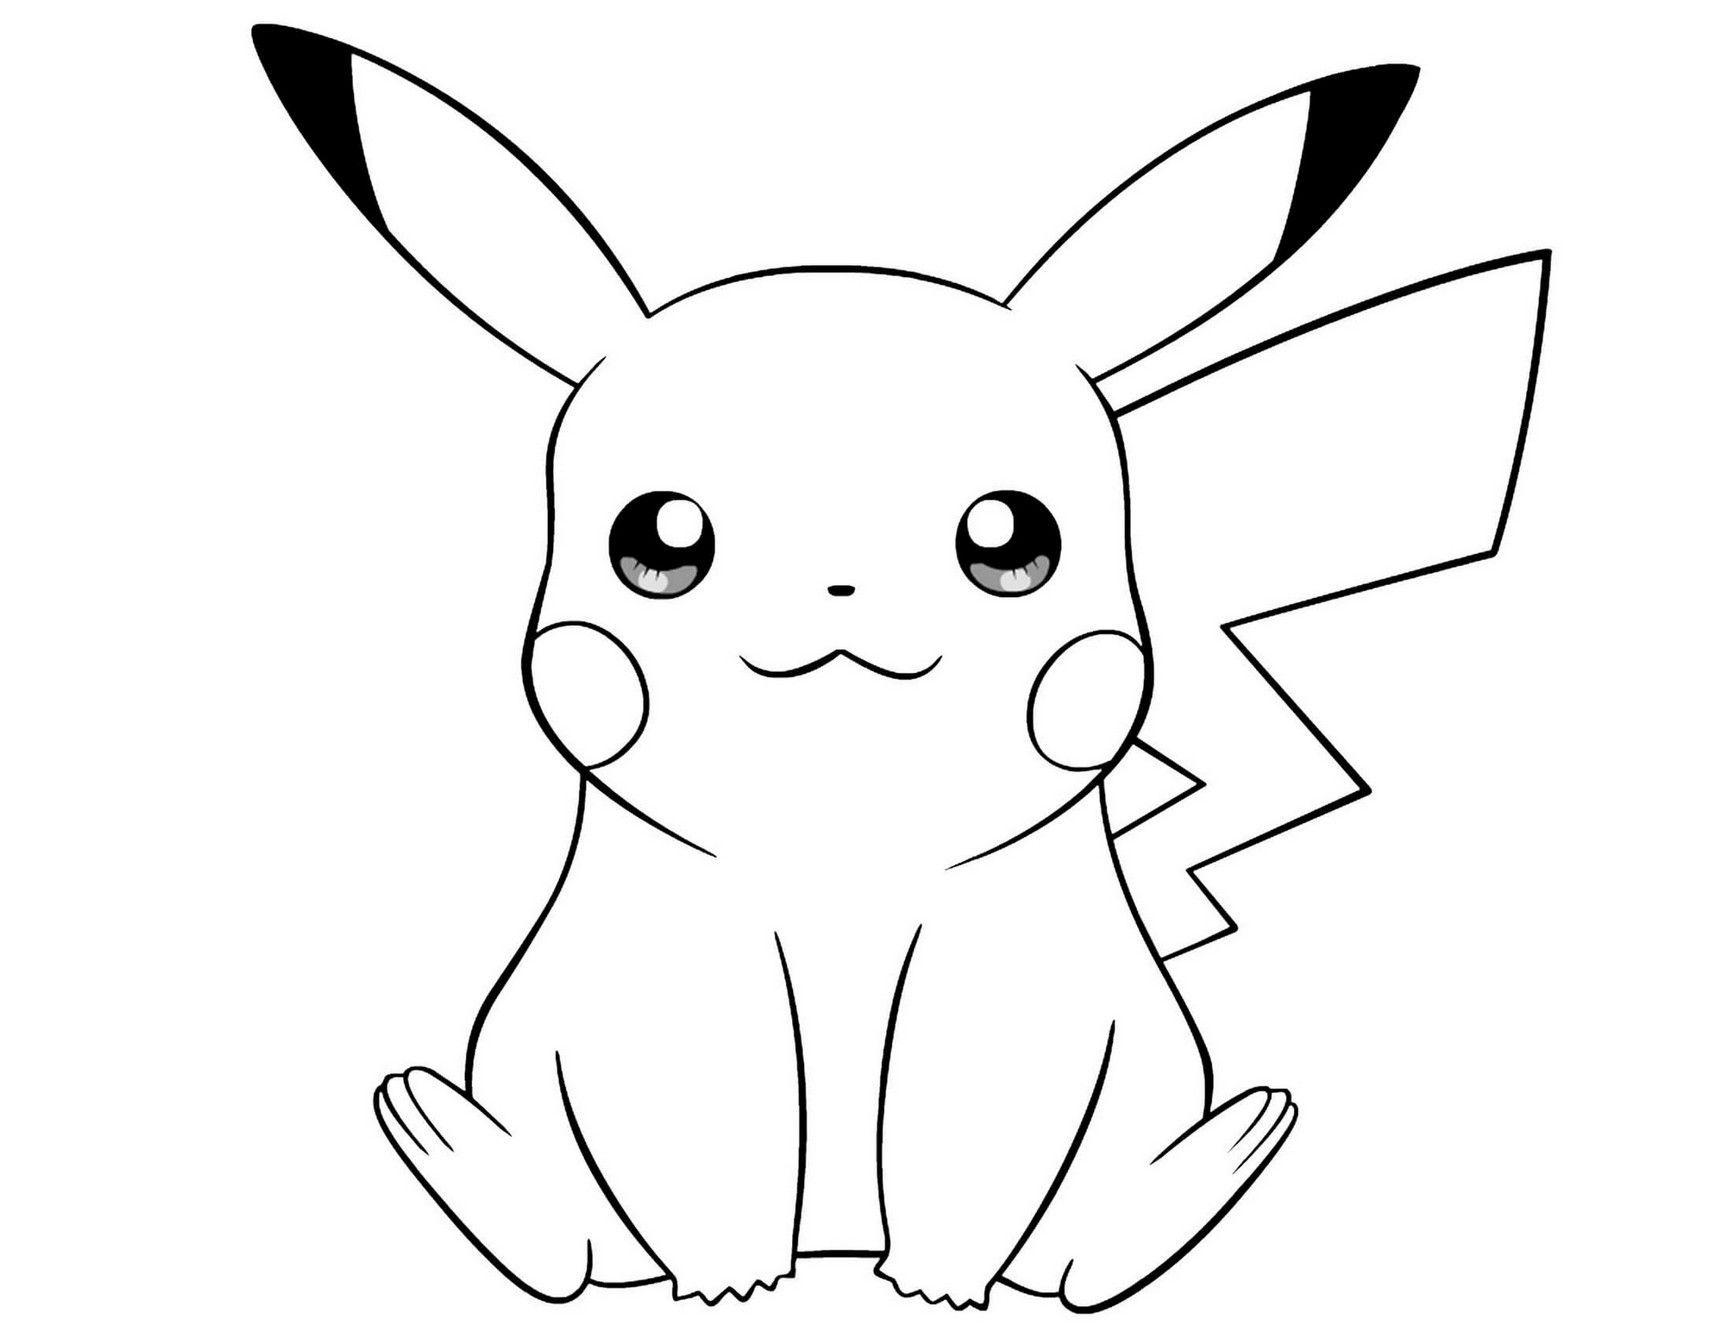 Coloring Page Pikachu Free Pikachu Coloring Page Pokemon Coloring Pokemon Coloring Pages